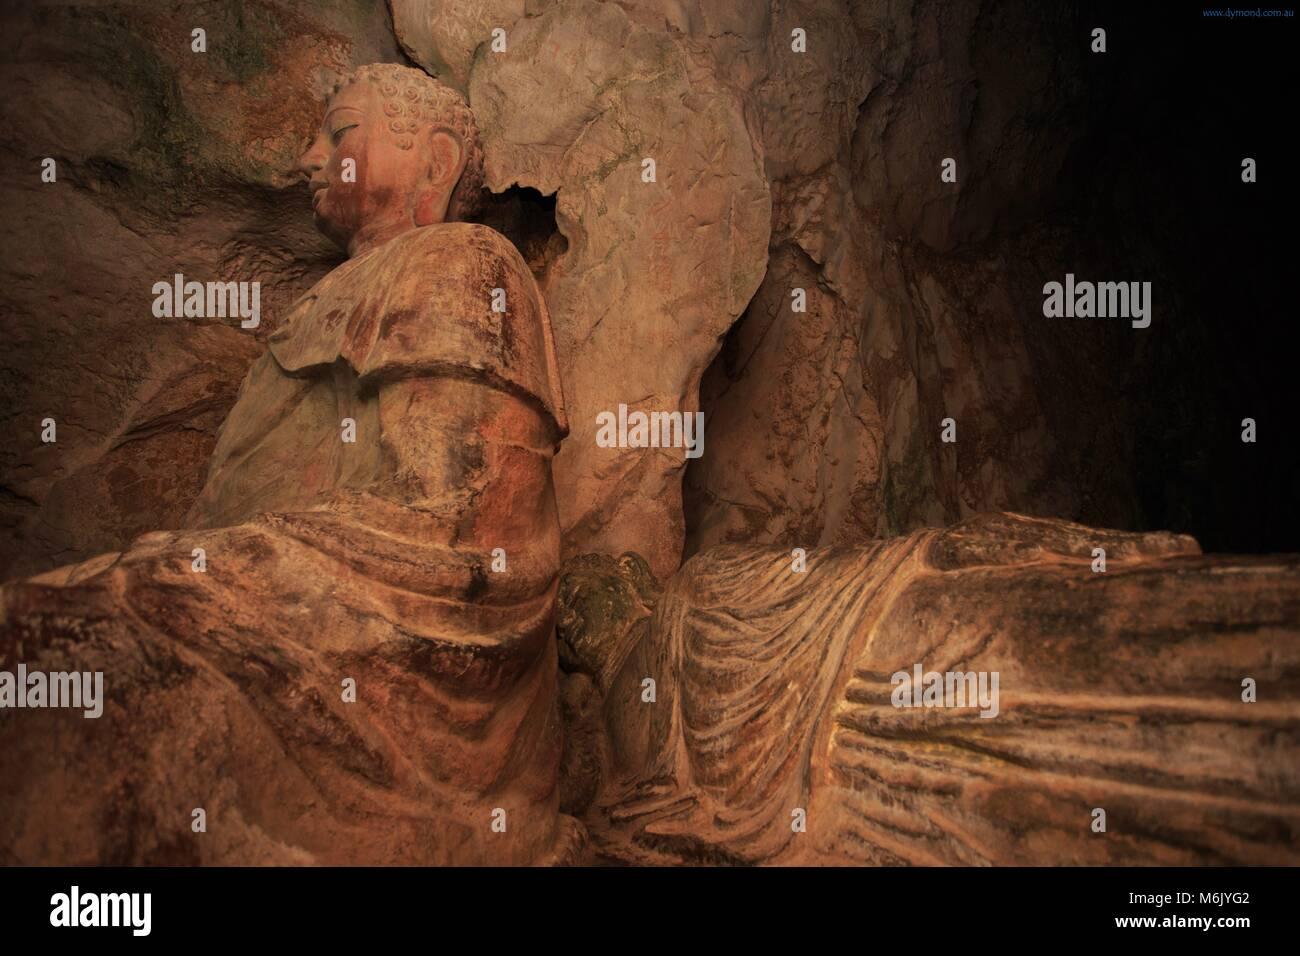 Tang Chon Cave on Nhuy Son Mountain, Da Nang, Vietnam - Stock Image